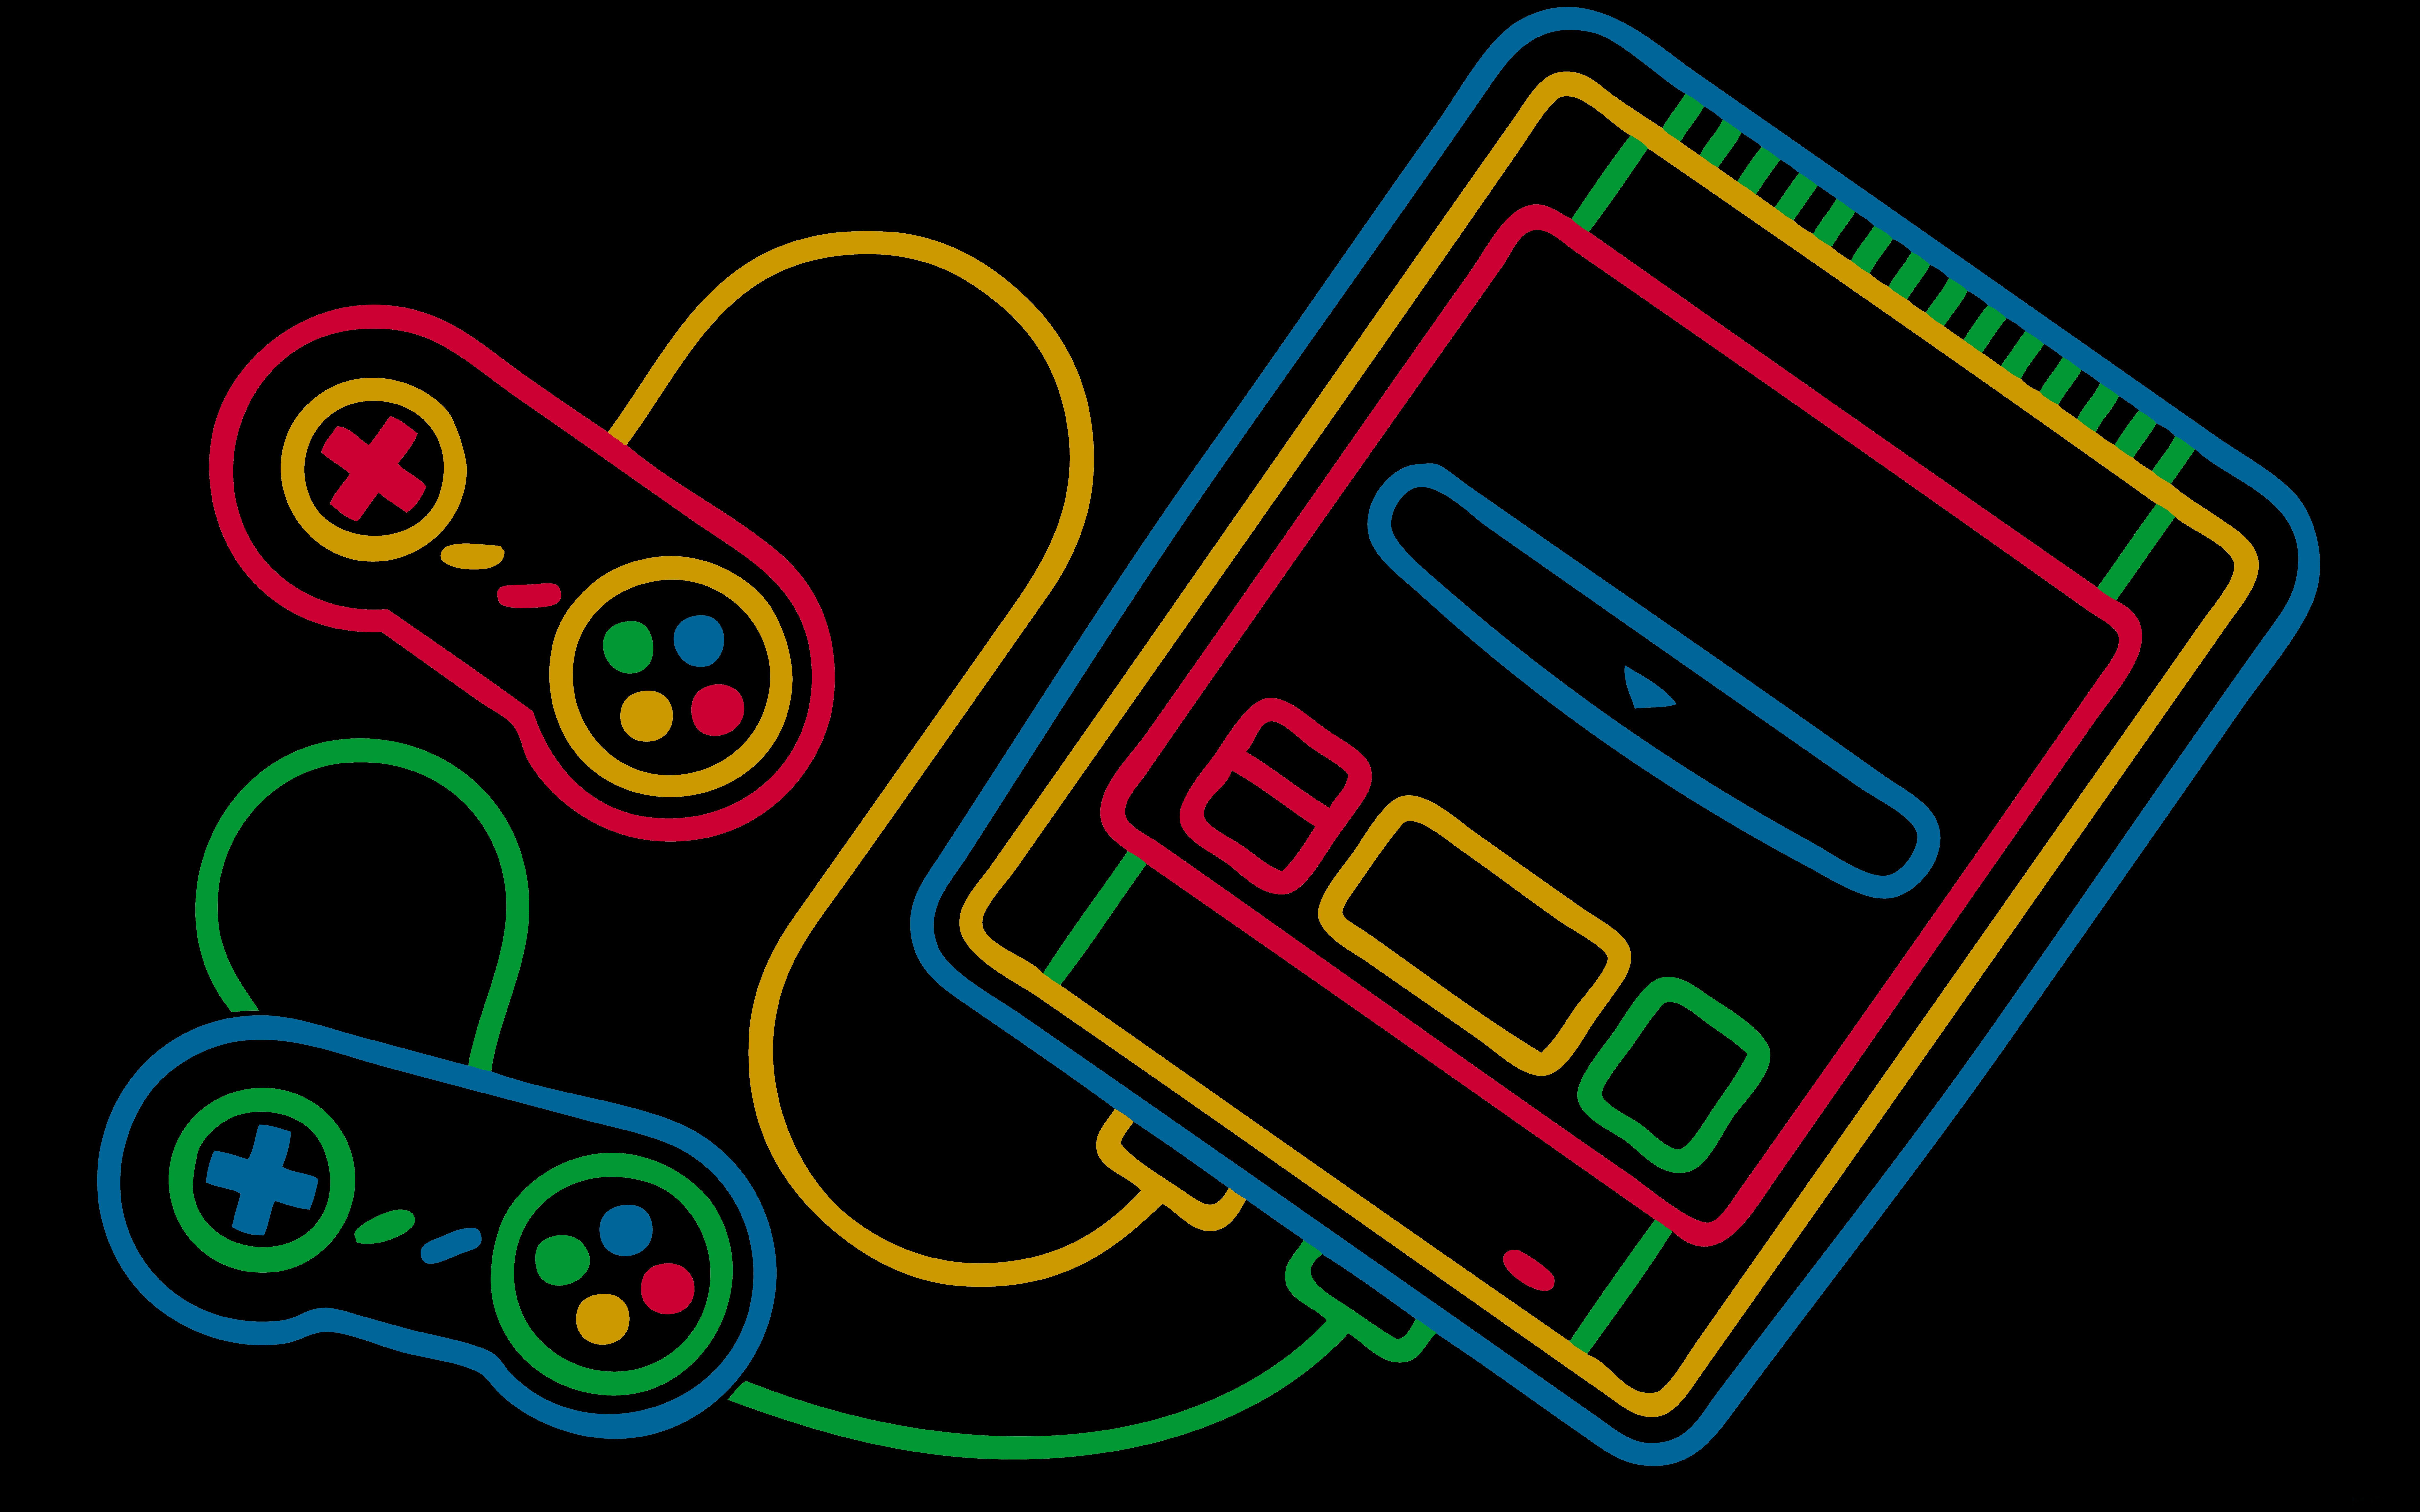 Super Box Art Video games nintendo, Retro video